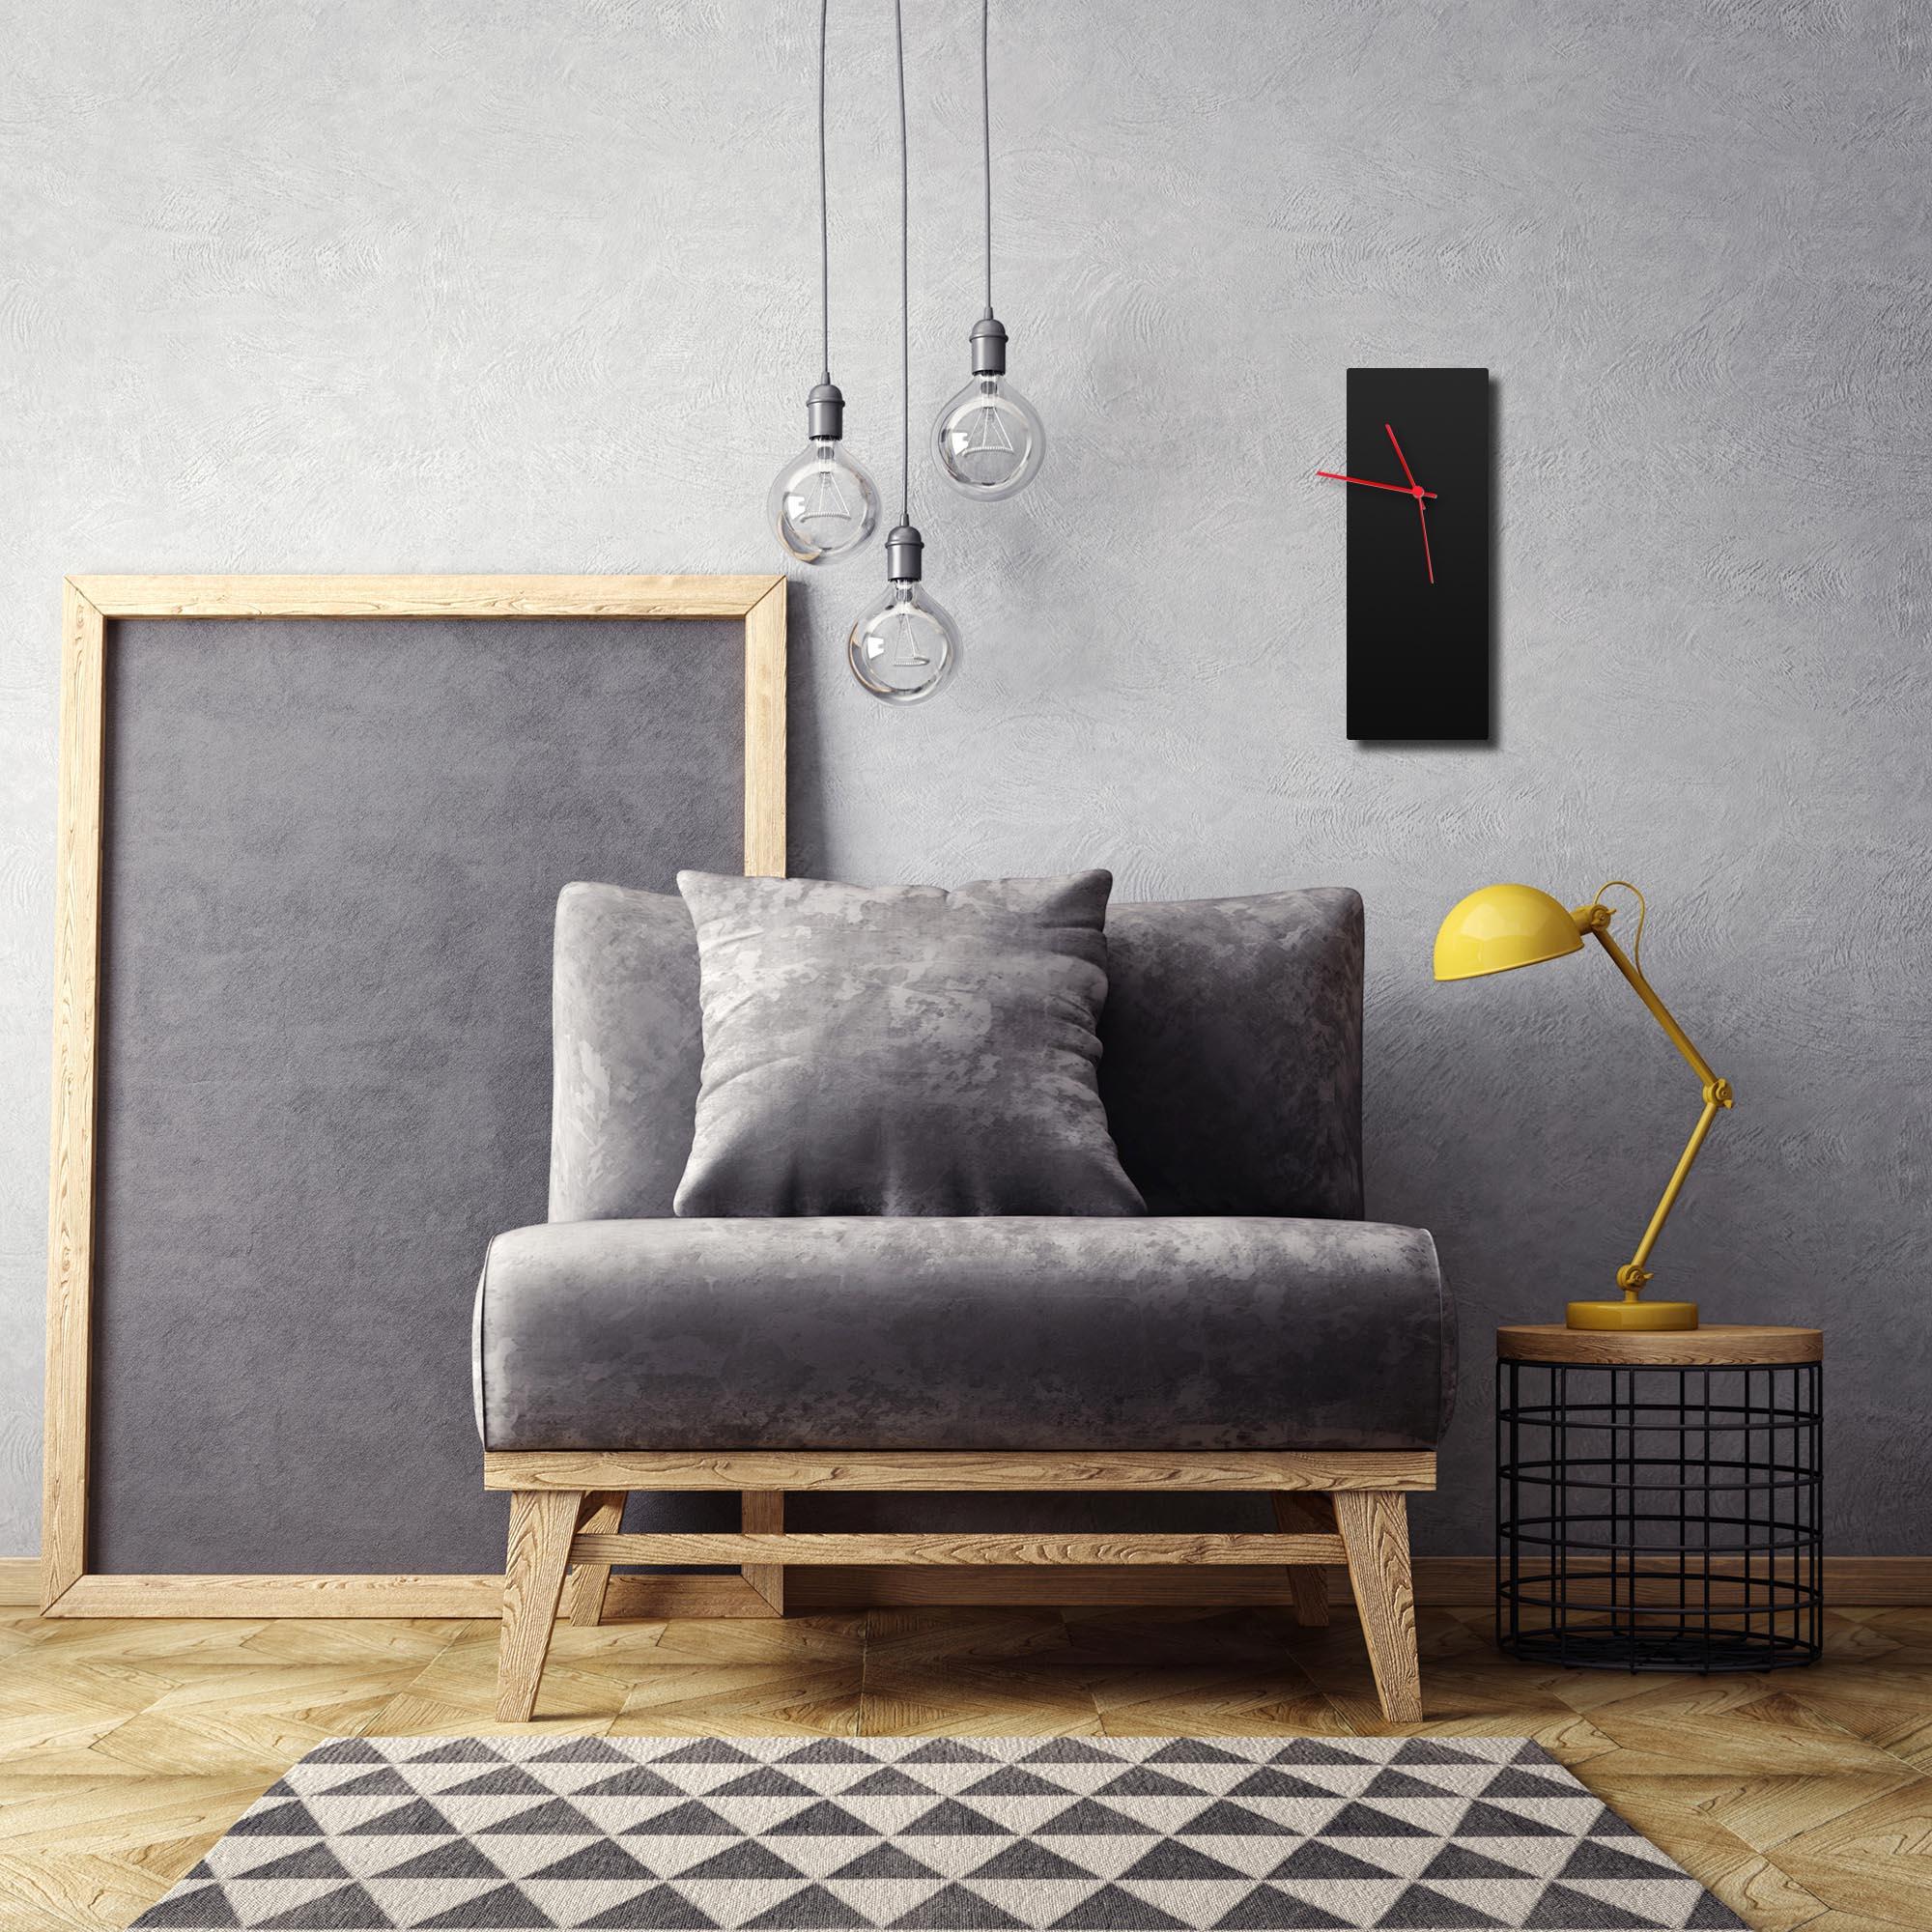 Blackout Red Clock by Adam Schwoeppe Contemporary Clock on Aluminum Polymetal - Alternate View 1